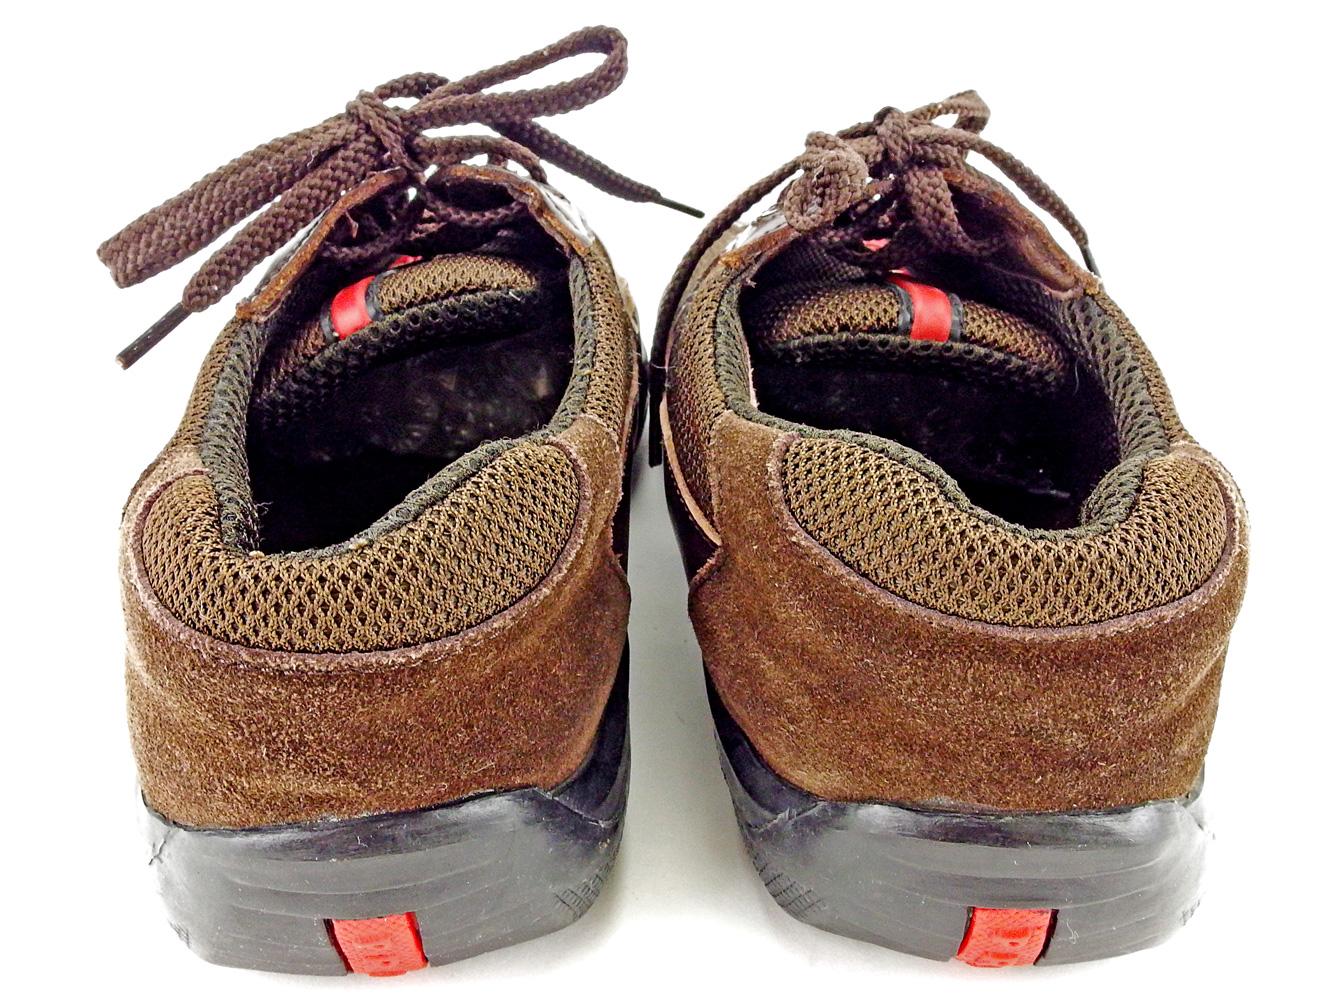 5af1fd637 ... Prada PRADA sneakers shoes shoes men ♯ 41 low-frequency cut sports line  brown X ...